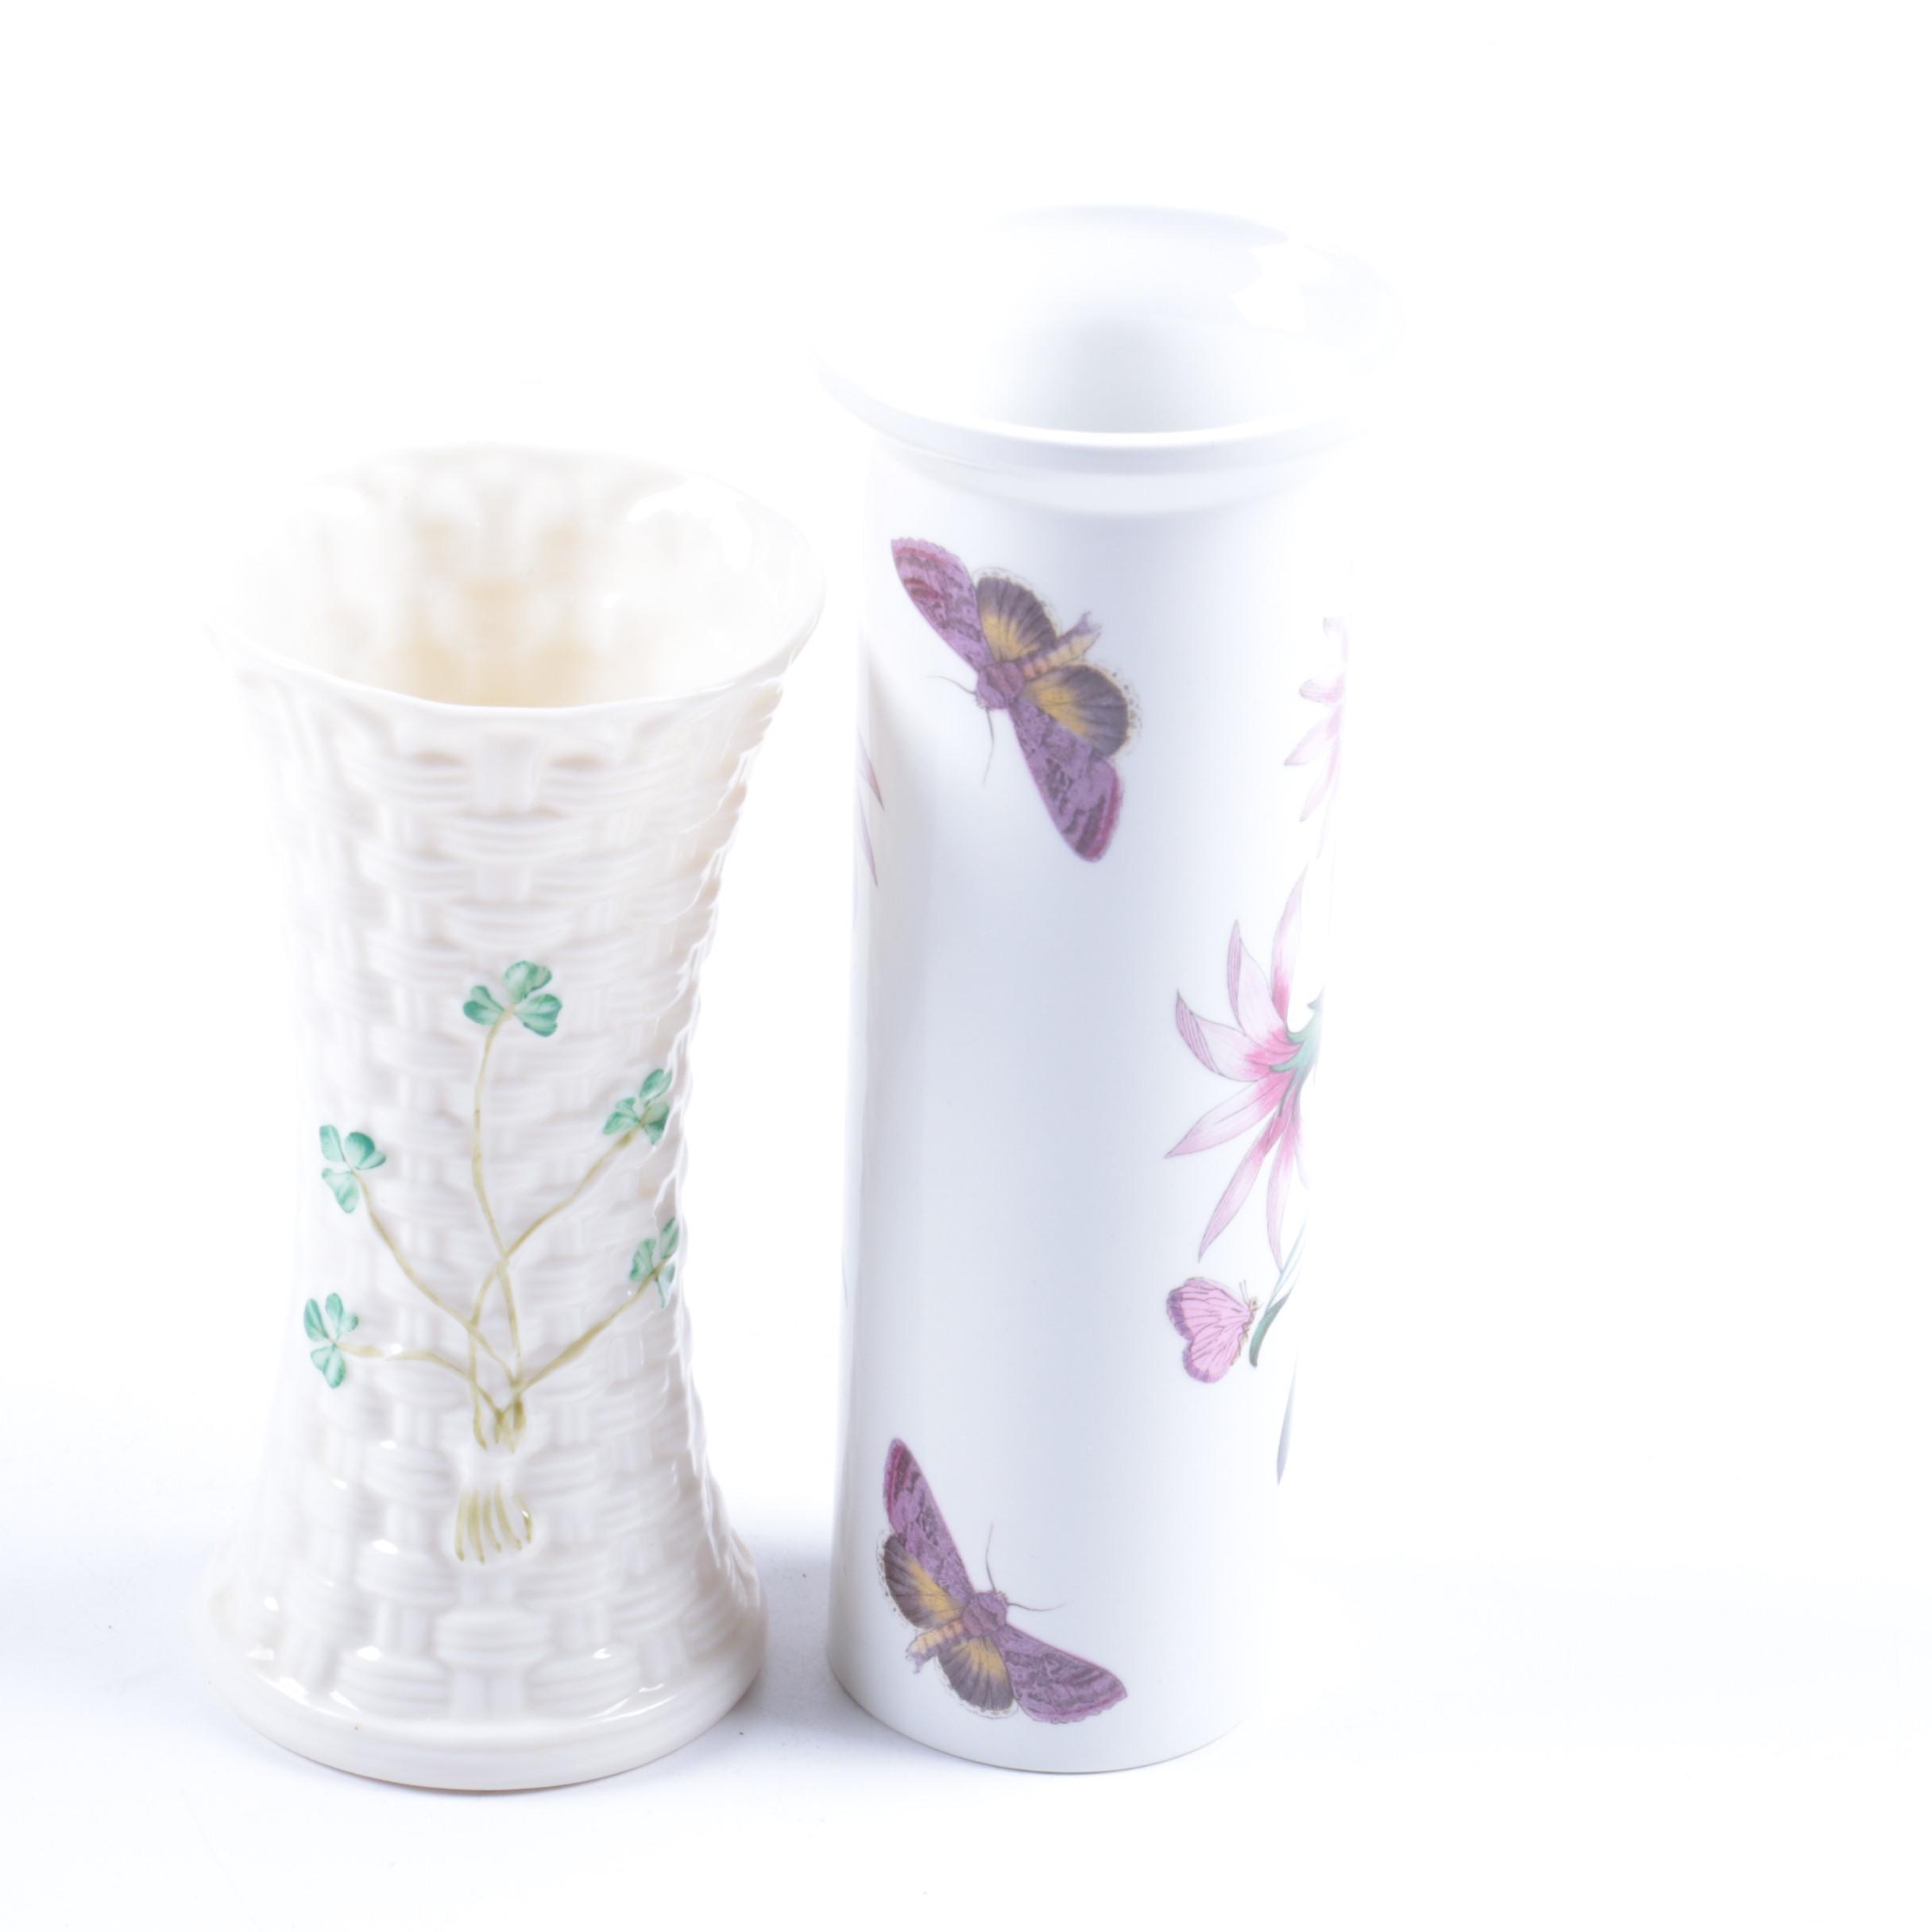 Belleek Porcelain Vase and Portmeirion Botanic Vase